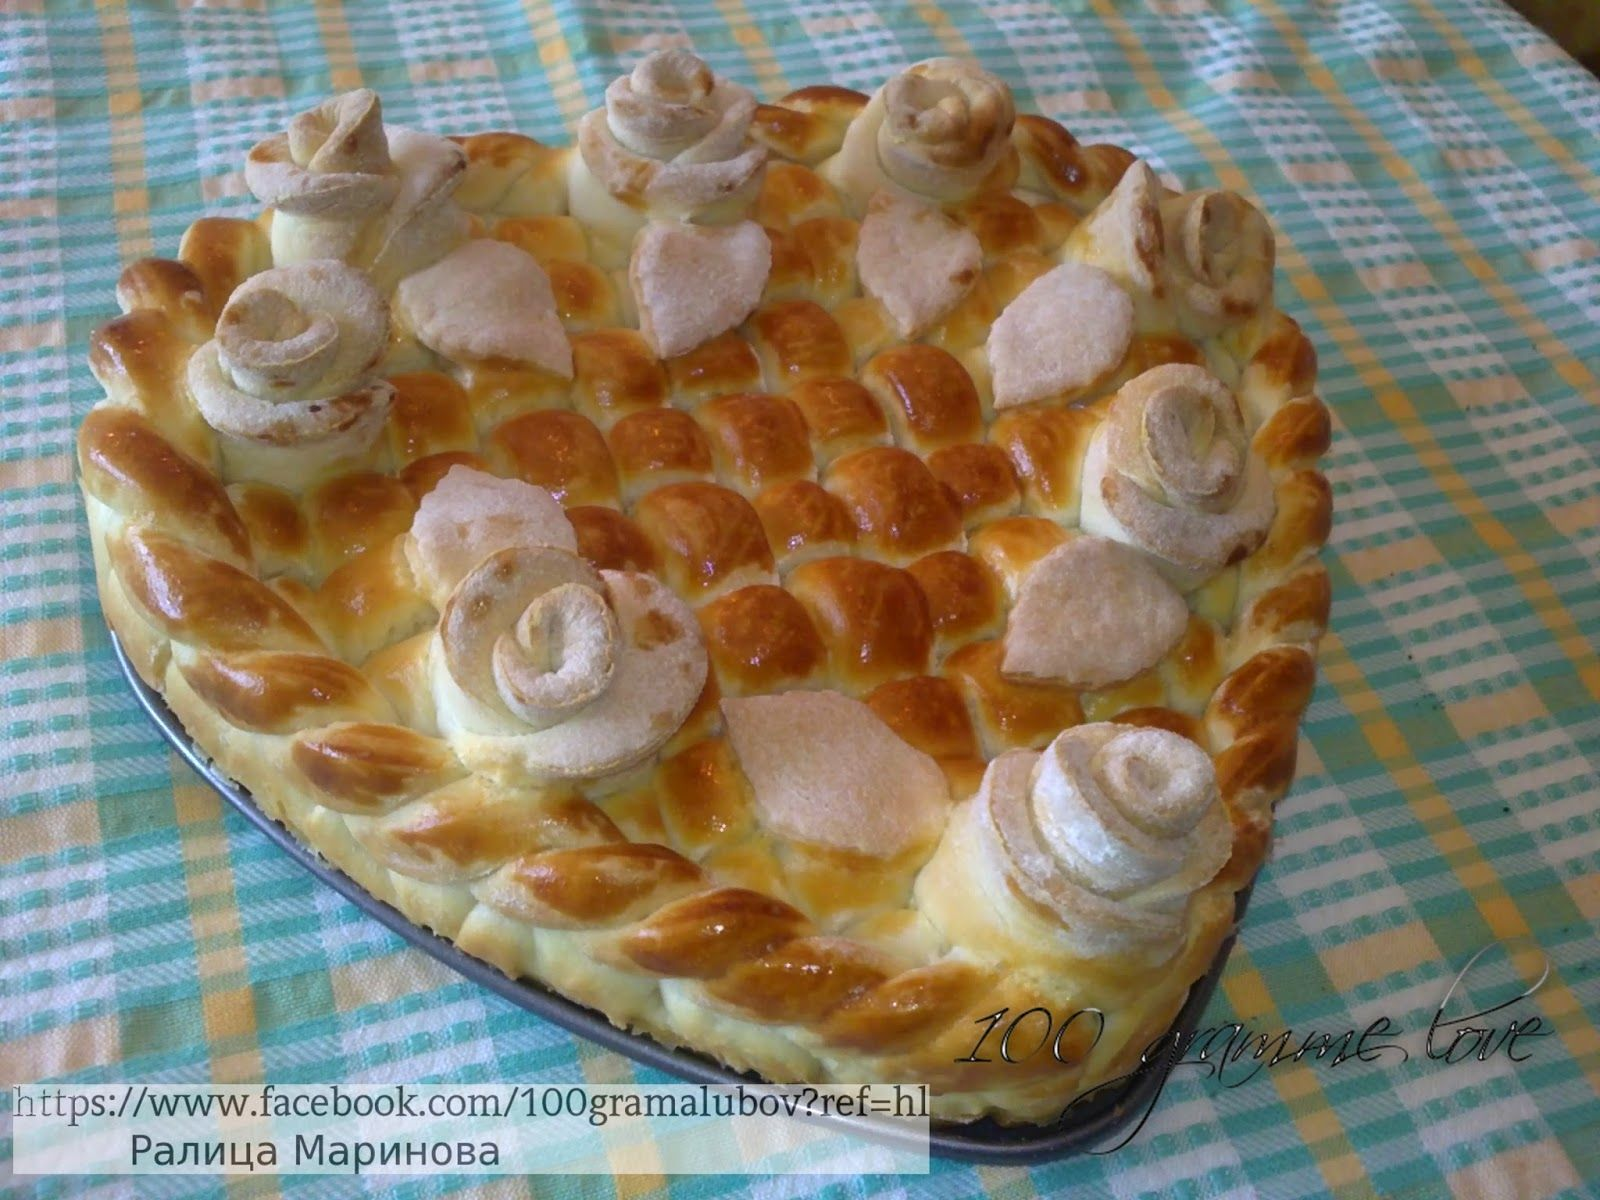 Une pincée de sel, une poignée de sucre et 100 grammes d'amour ... Ralitsa Marinova: Heart Pita